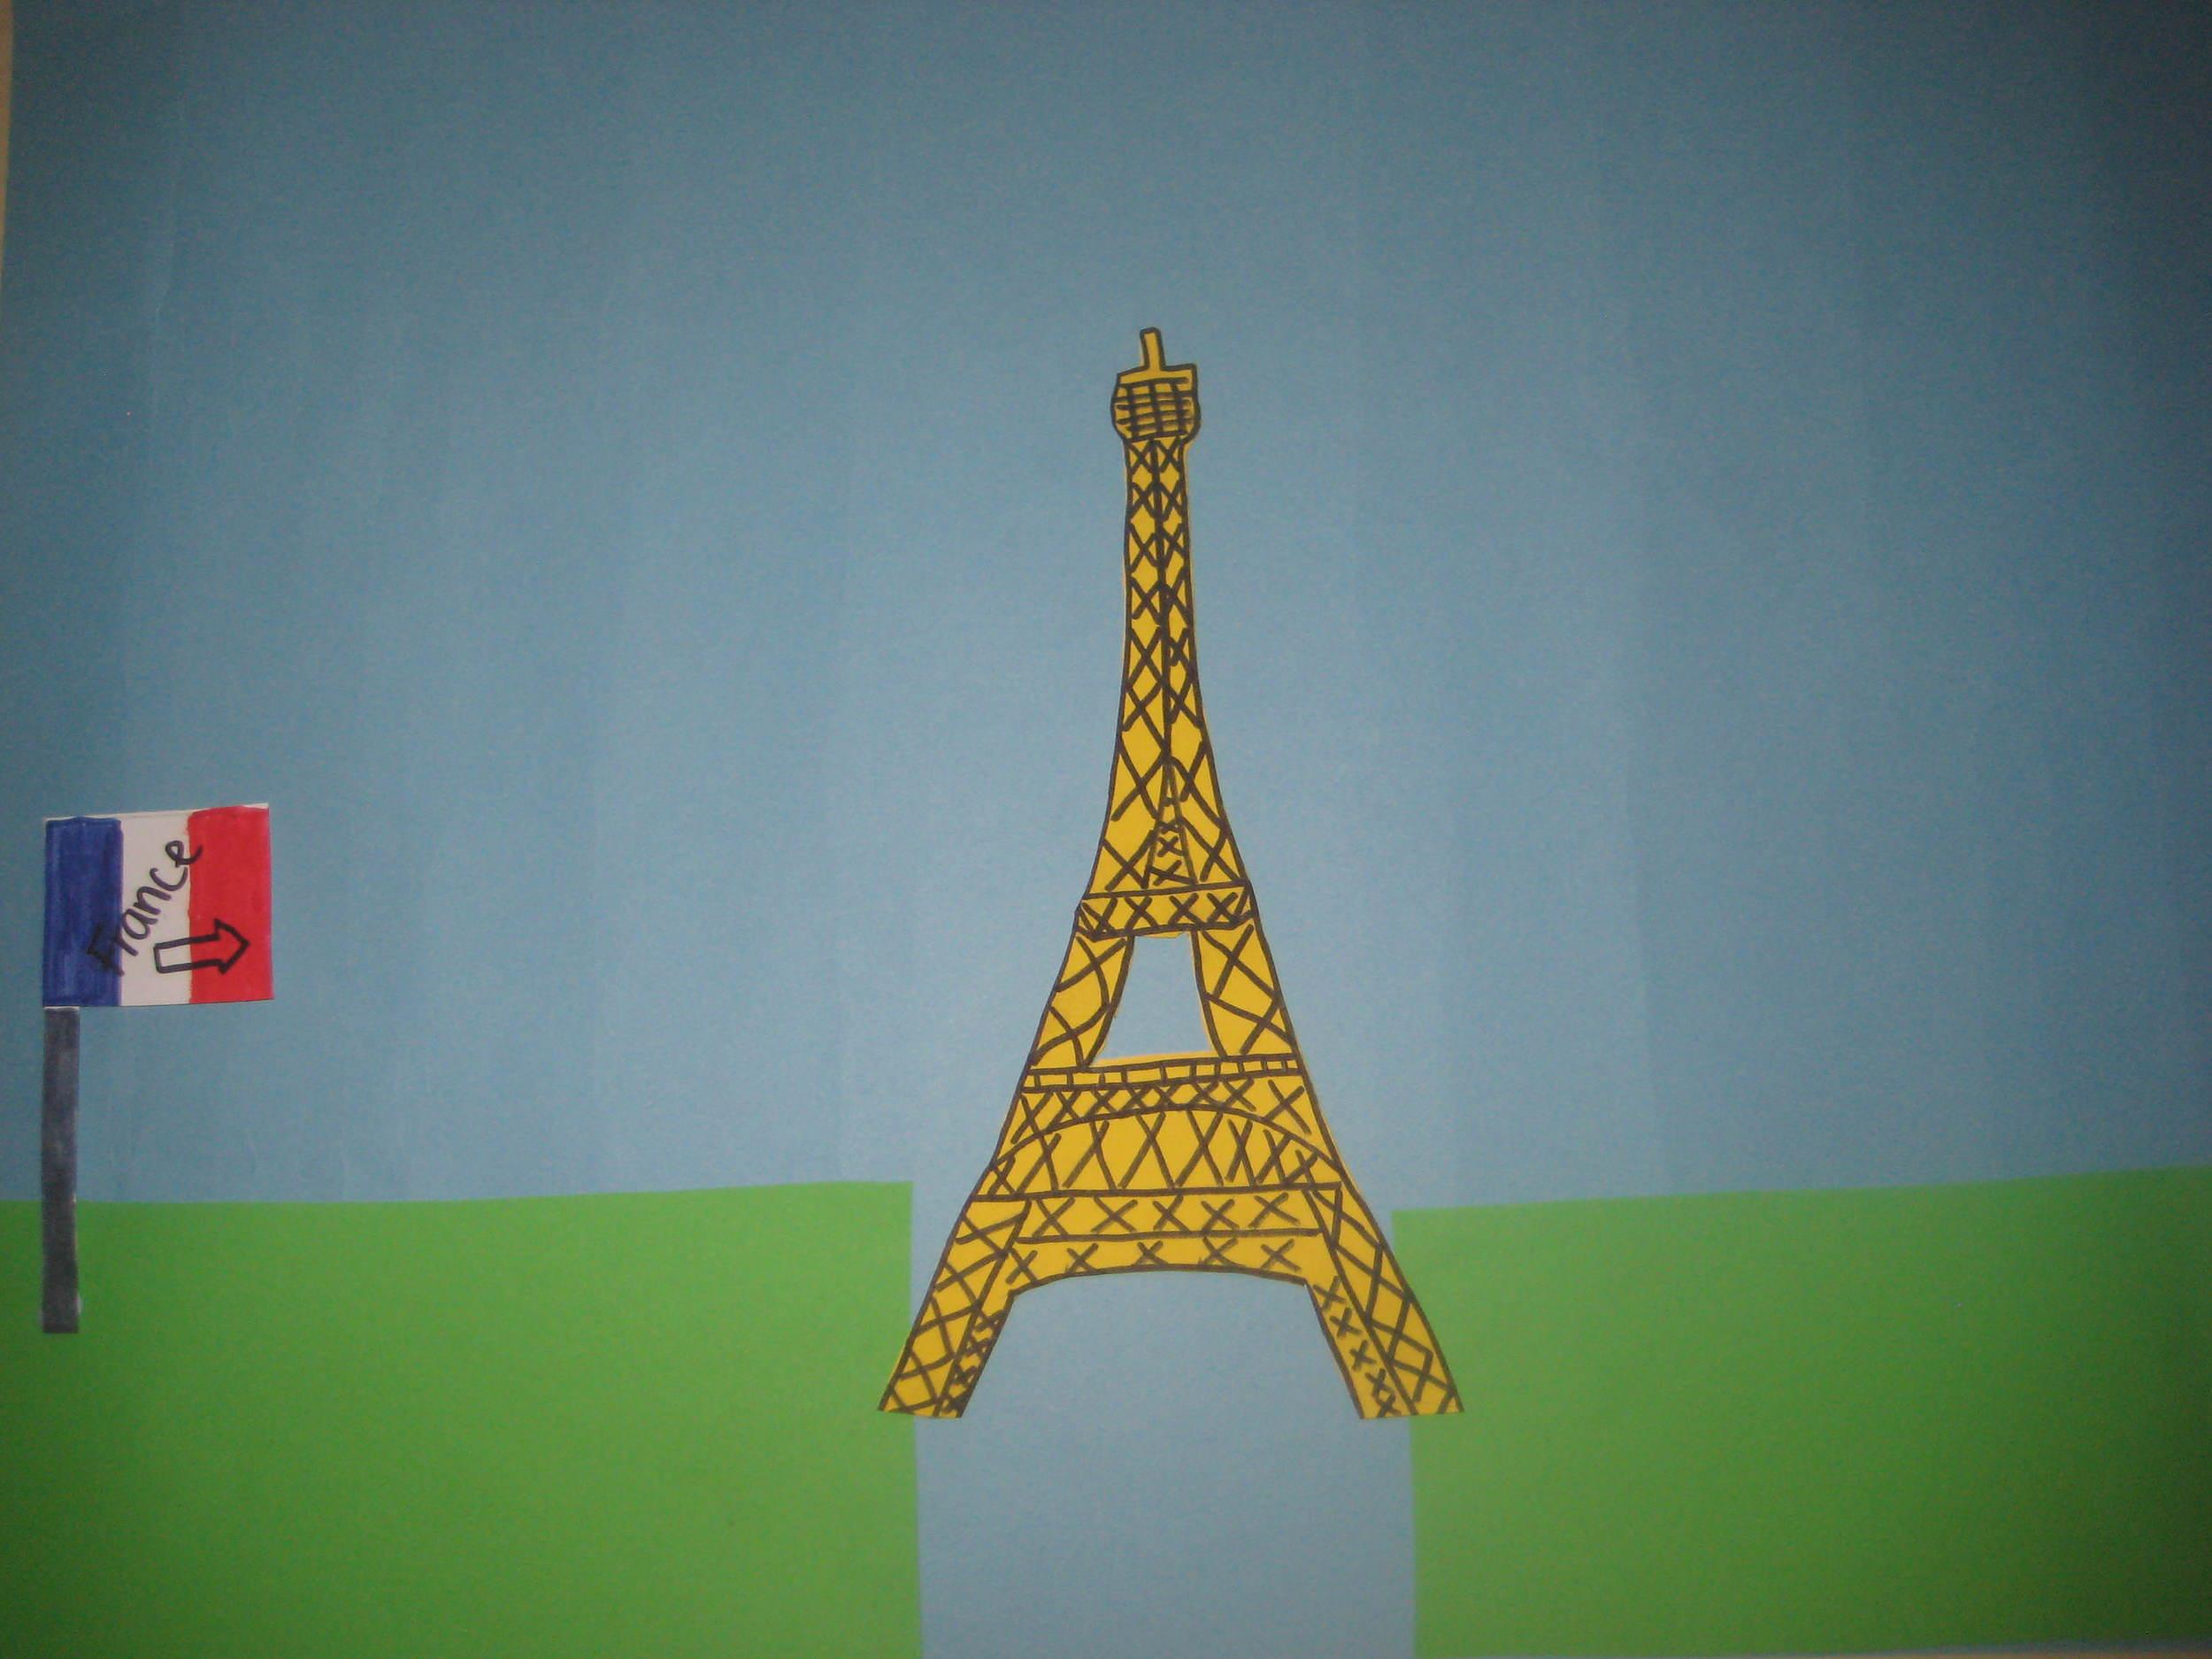 animationpics2 002.JPG